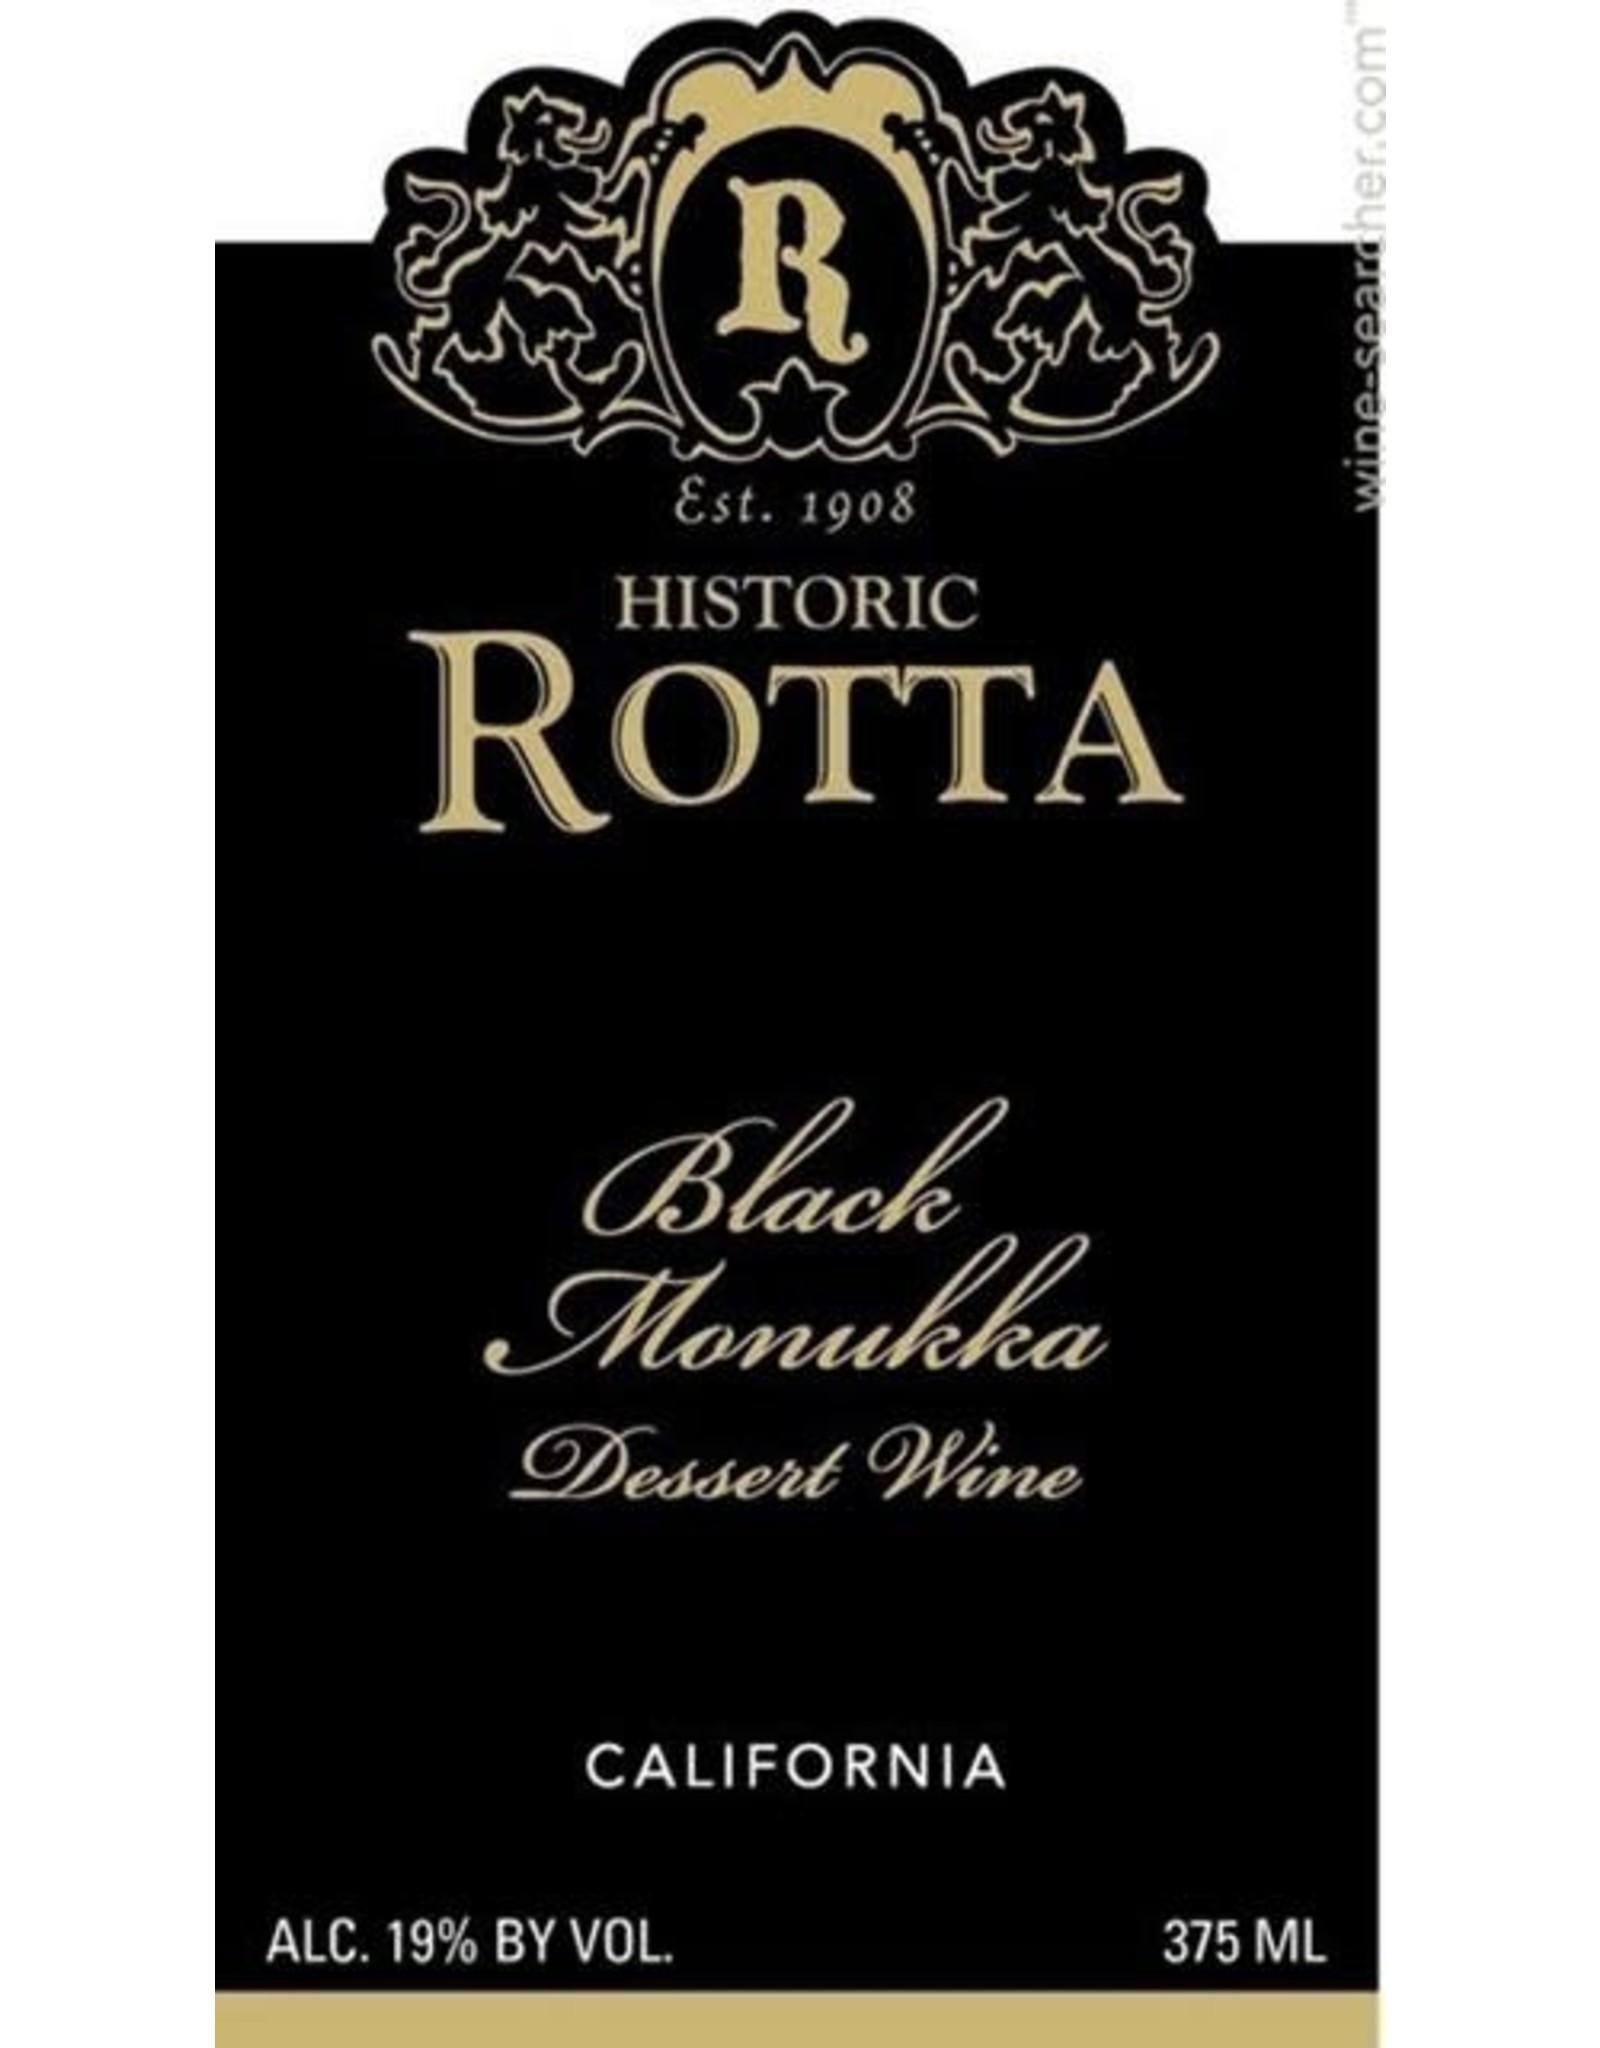 HISTORIC ROTTA DESSERT WINE 375ml